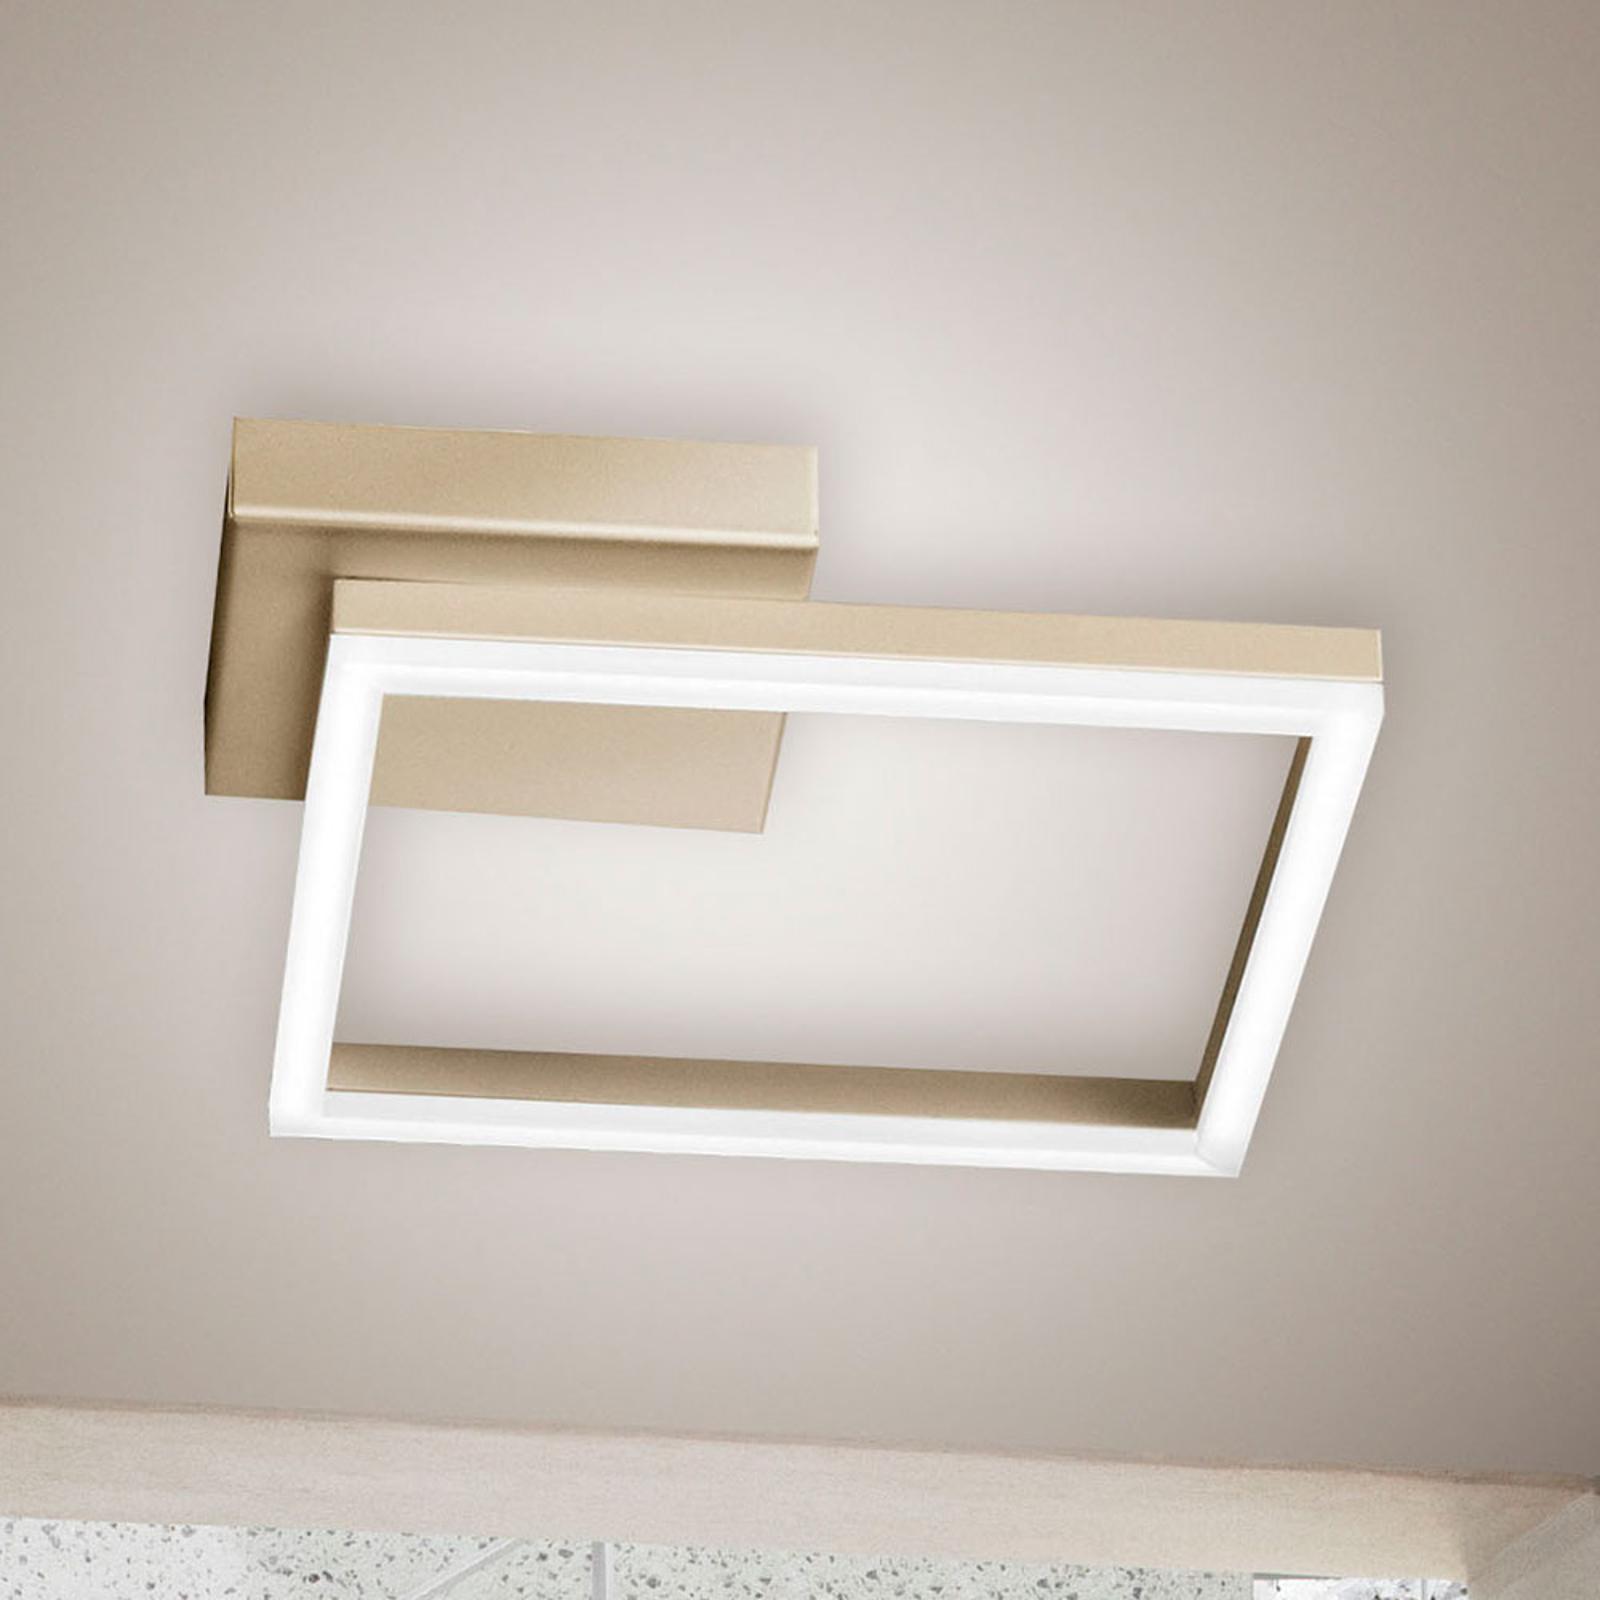 LED-Deckenleuchte Bard, 27x27cm, Mattgold-Finish